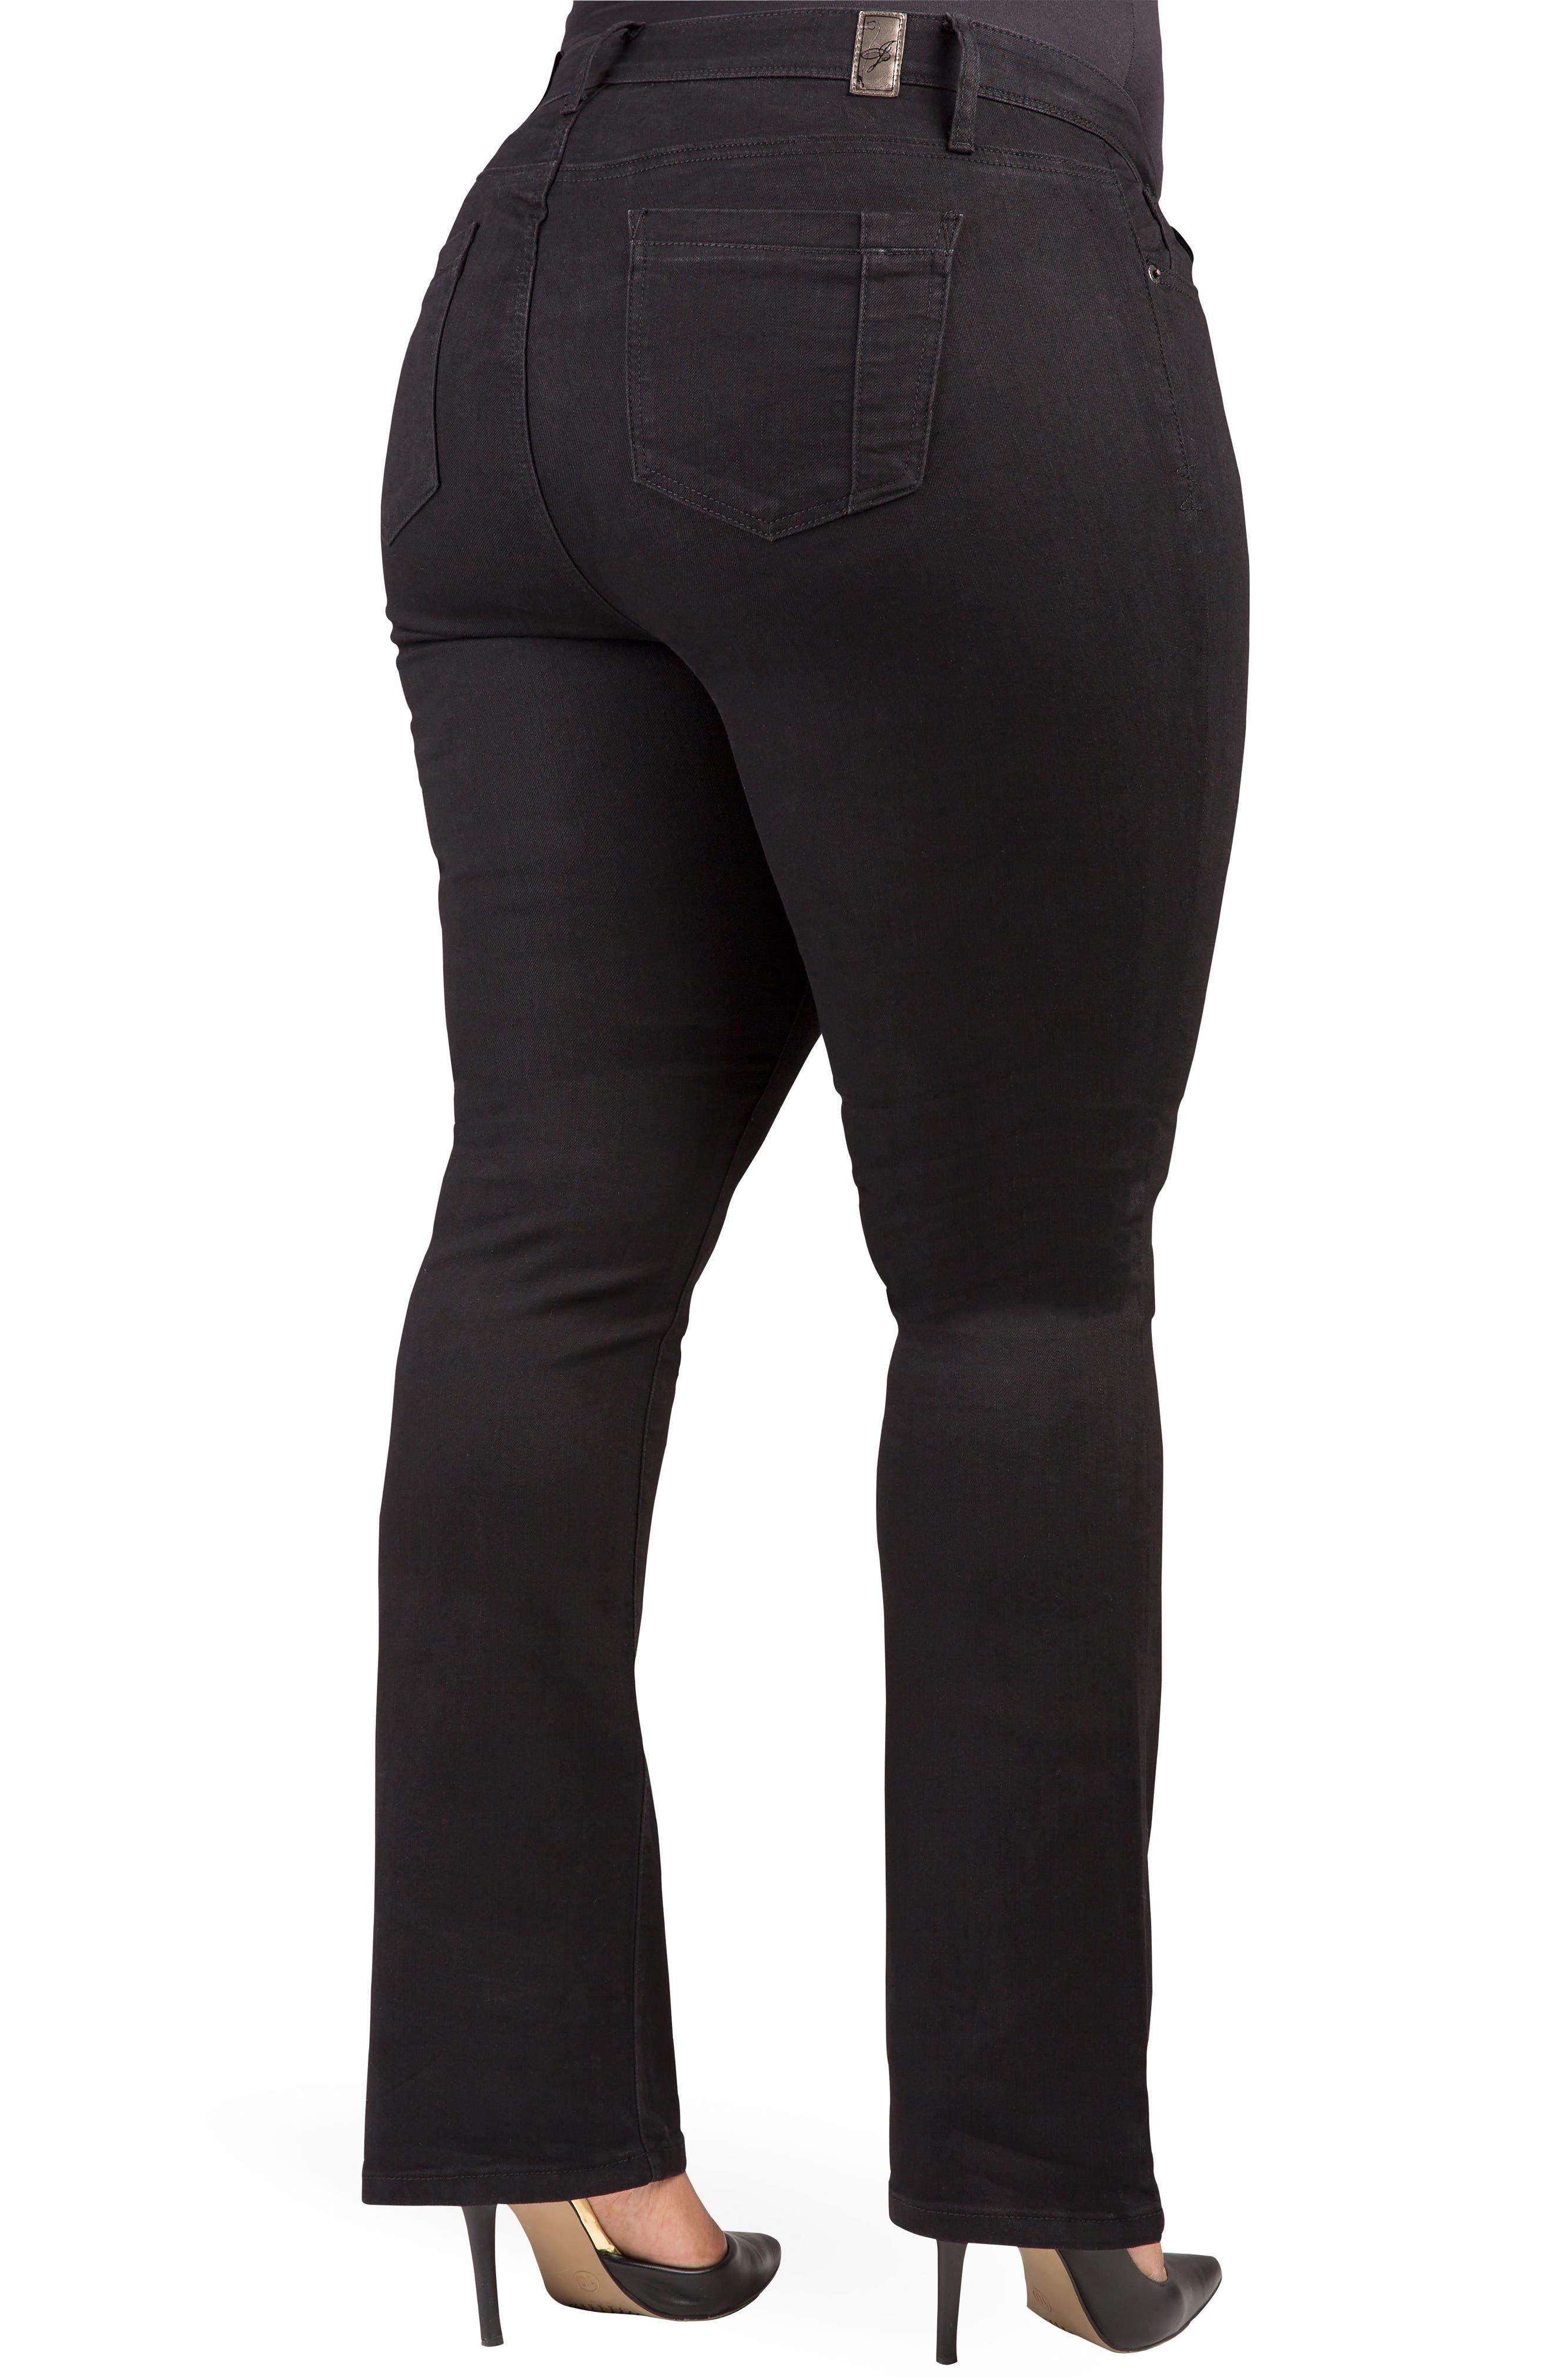 POETIC JUSTICE, Scarlett Slim Bootcut Curvy Fit Jeans, Alternate thumbnail 2, color, RINSE BLACK